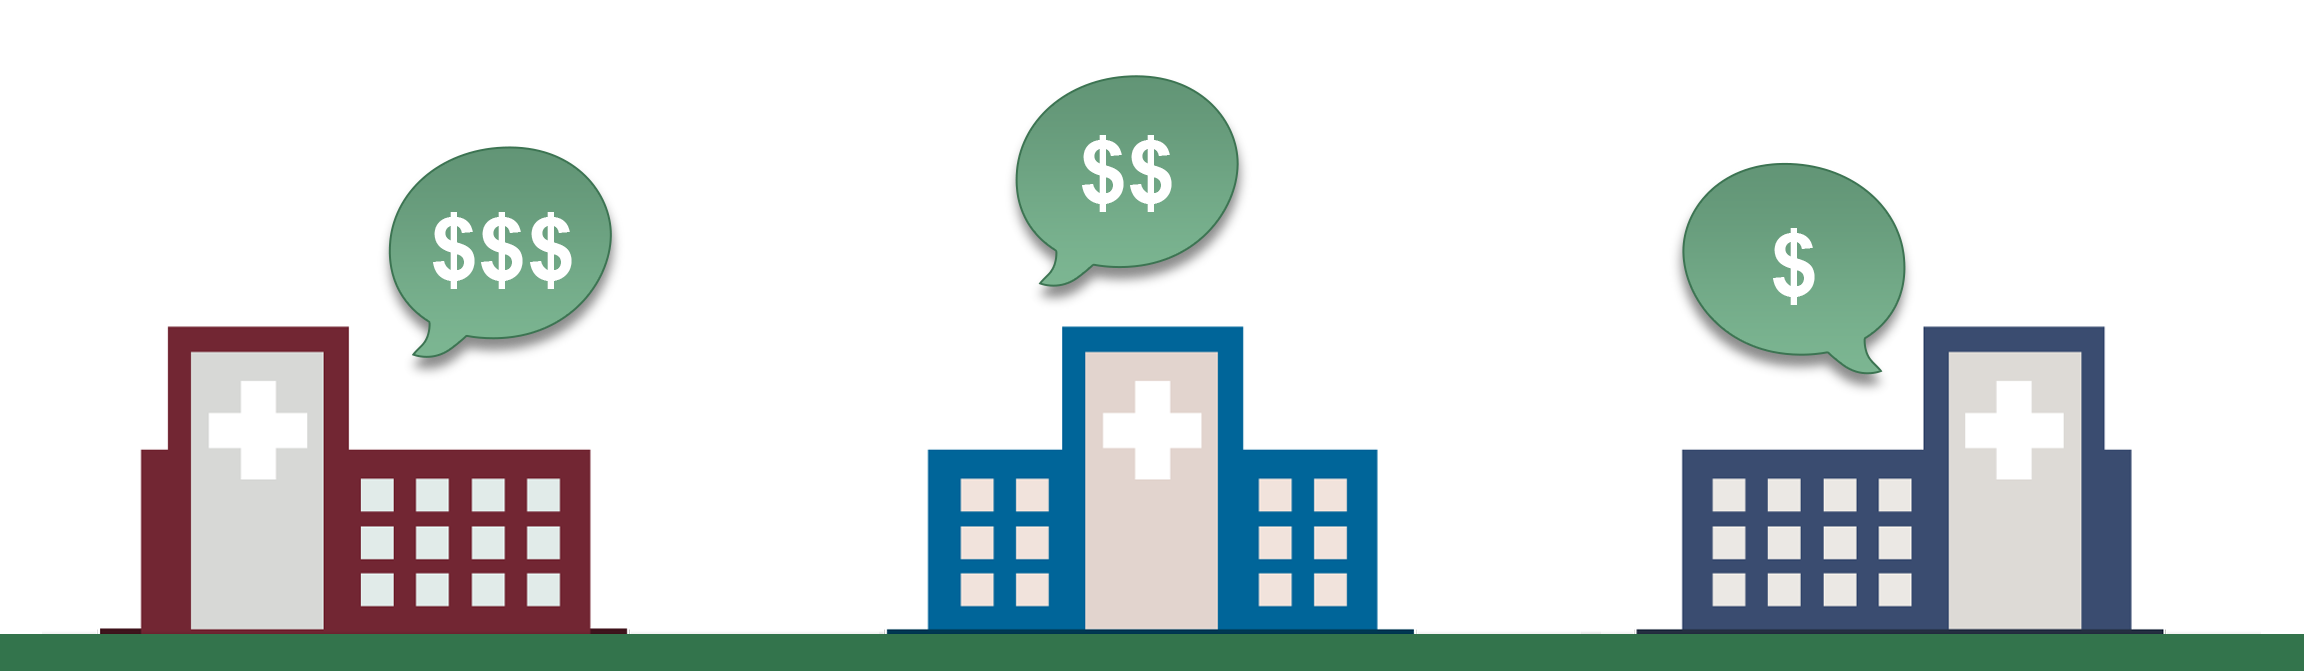 BCBSNC | Estimate Your Health Care Costs